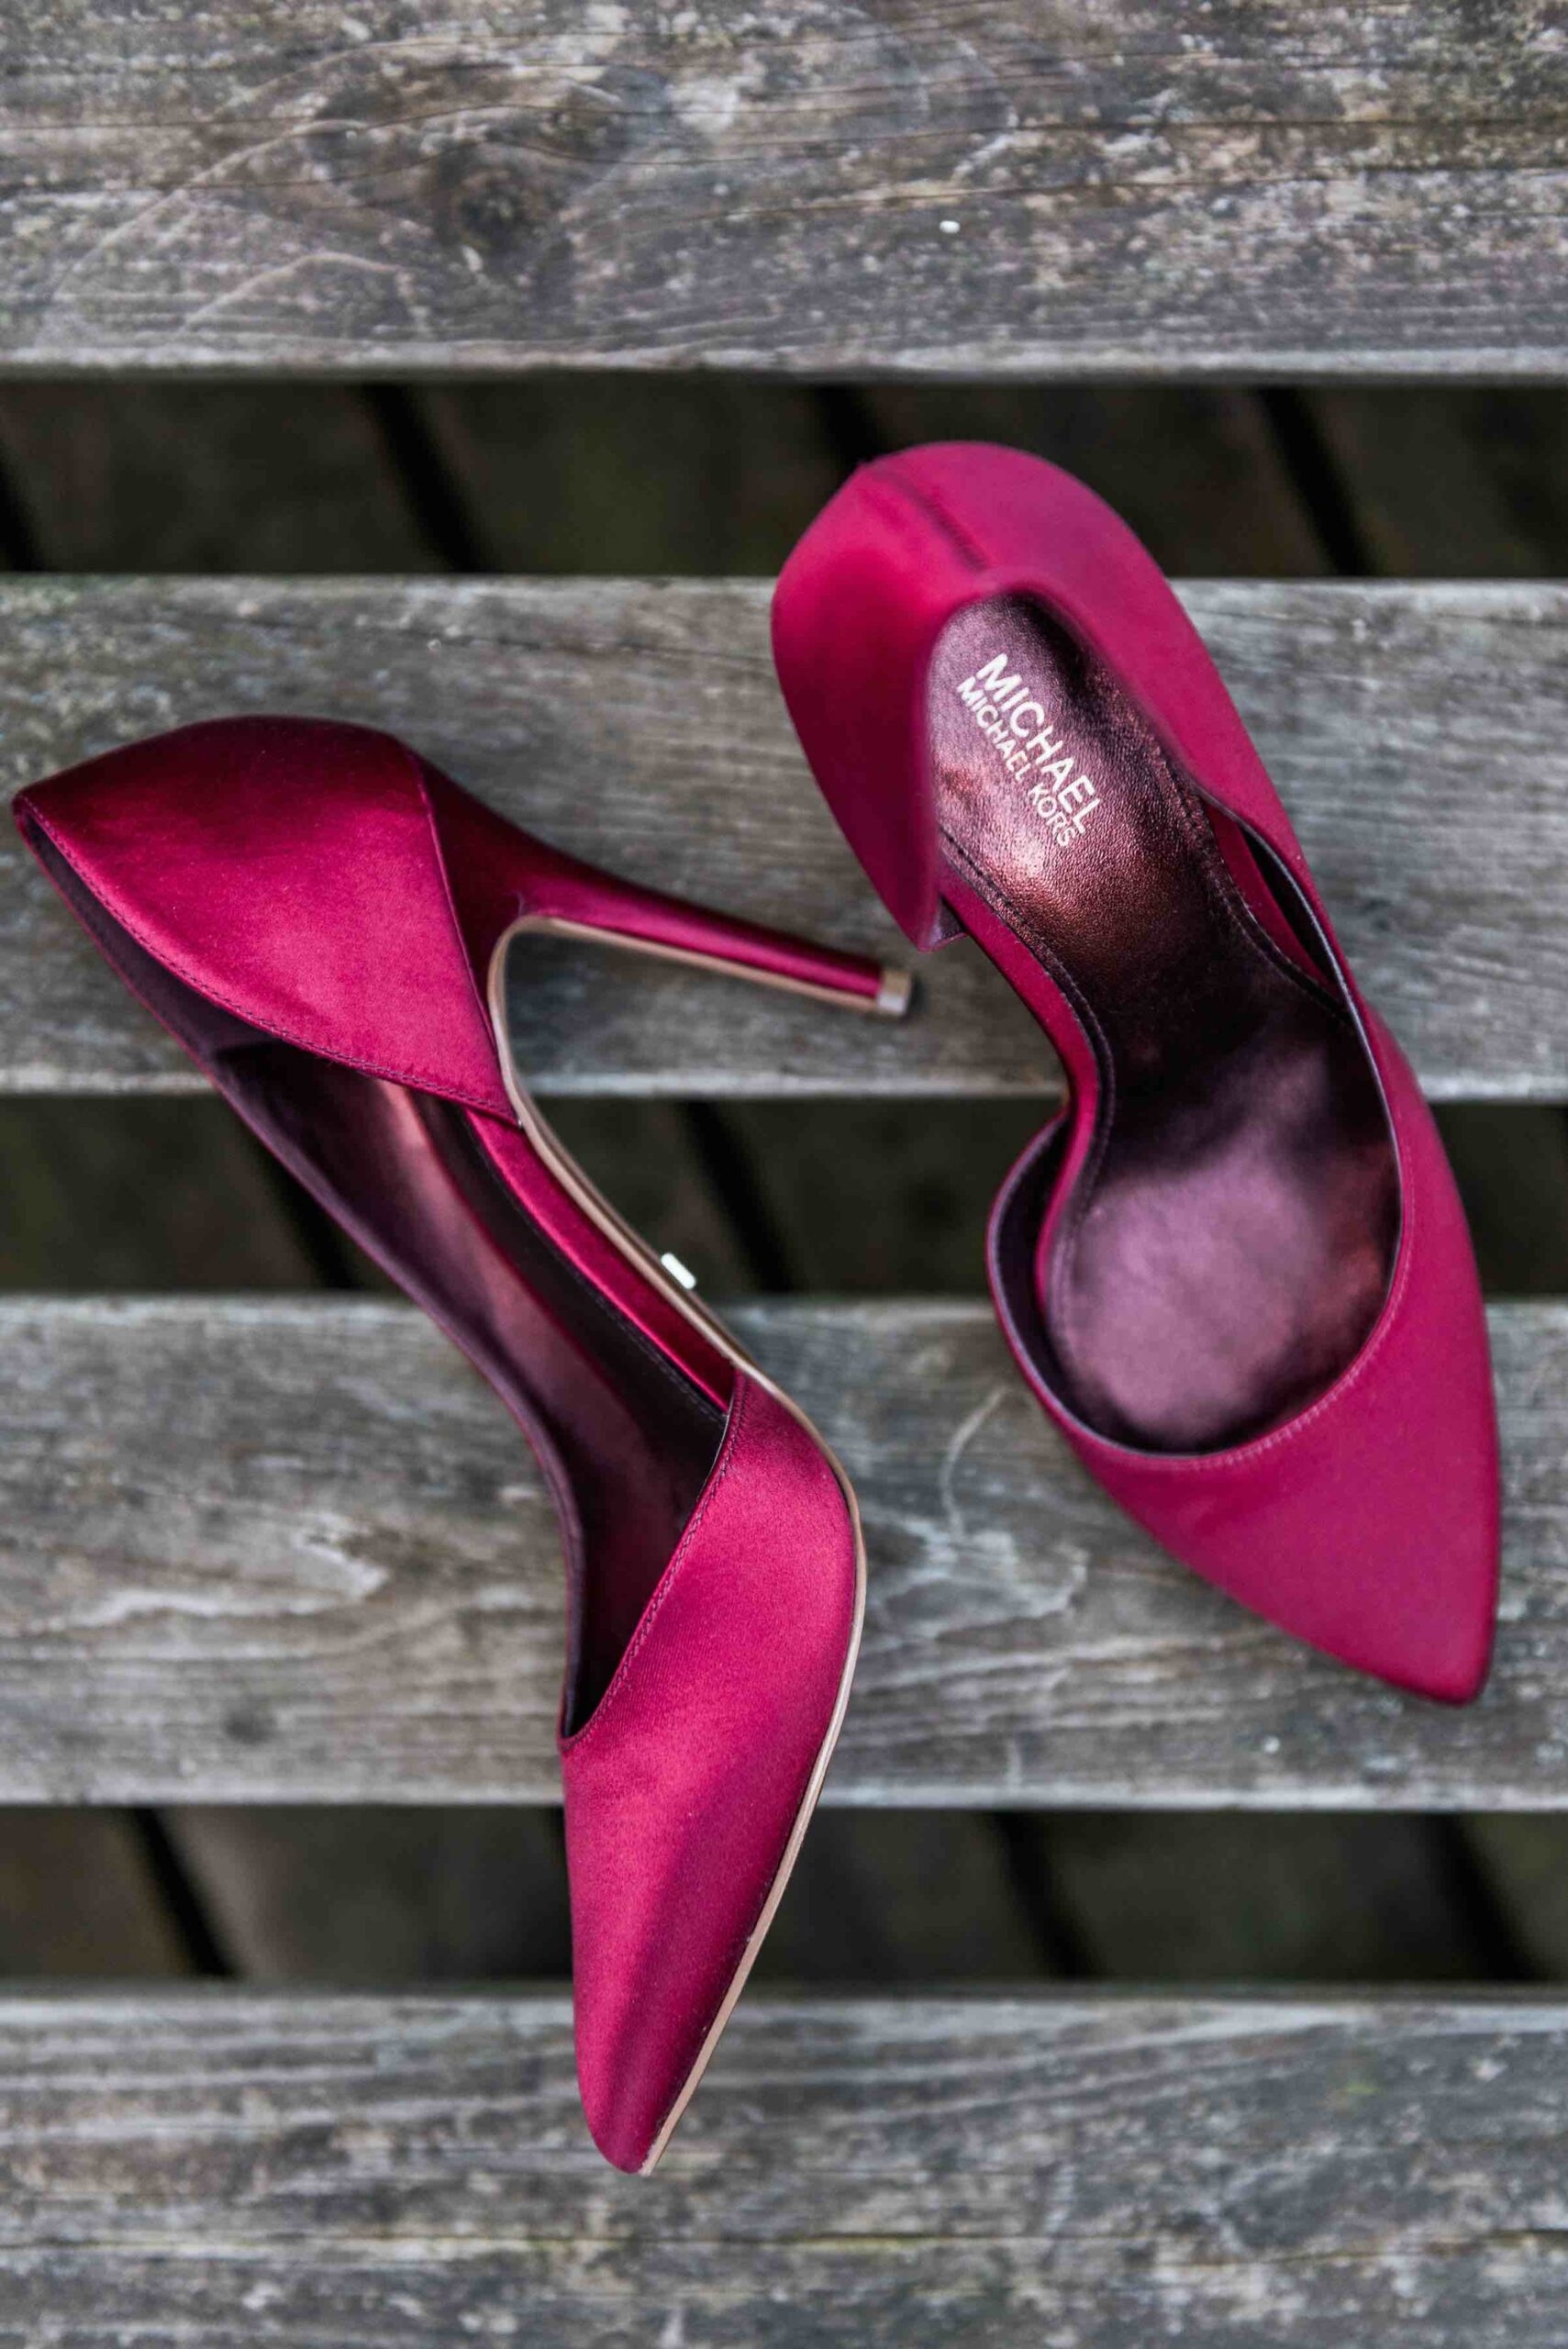 Michael Kors shoes for a wedding in Scheveningen